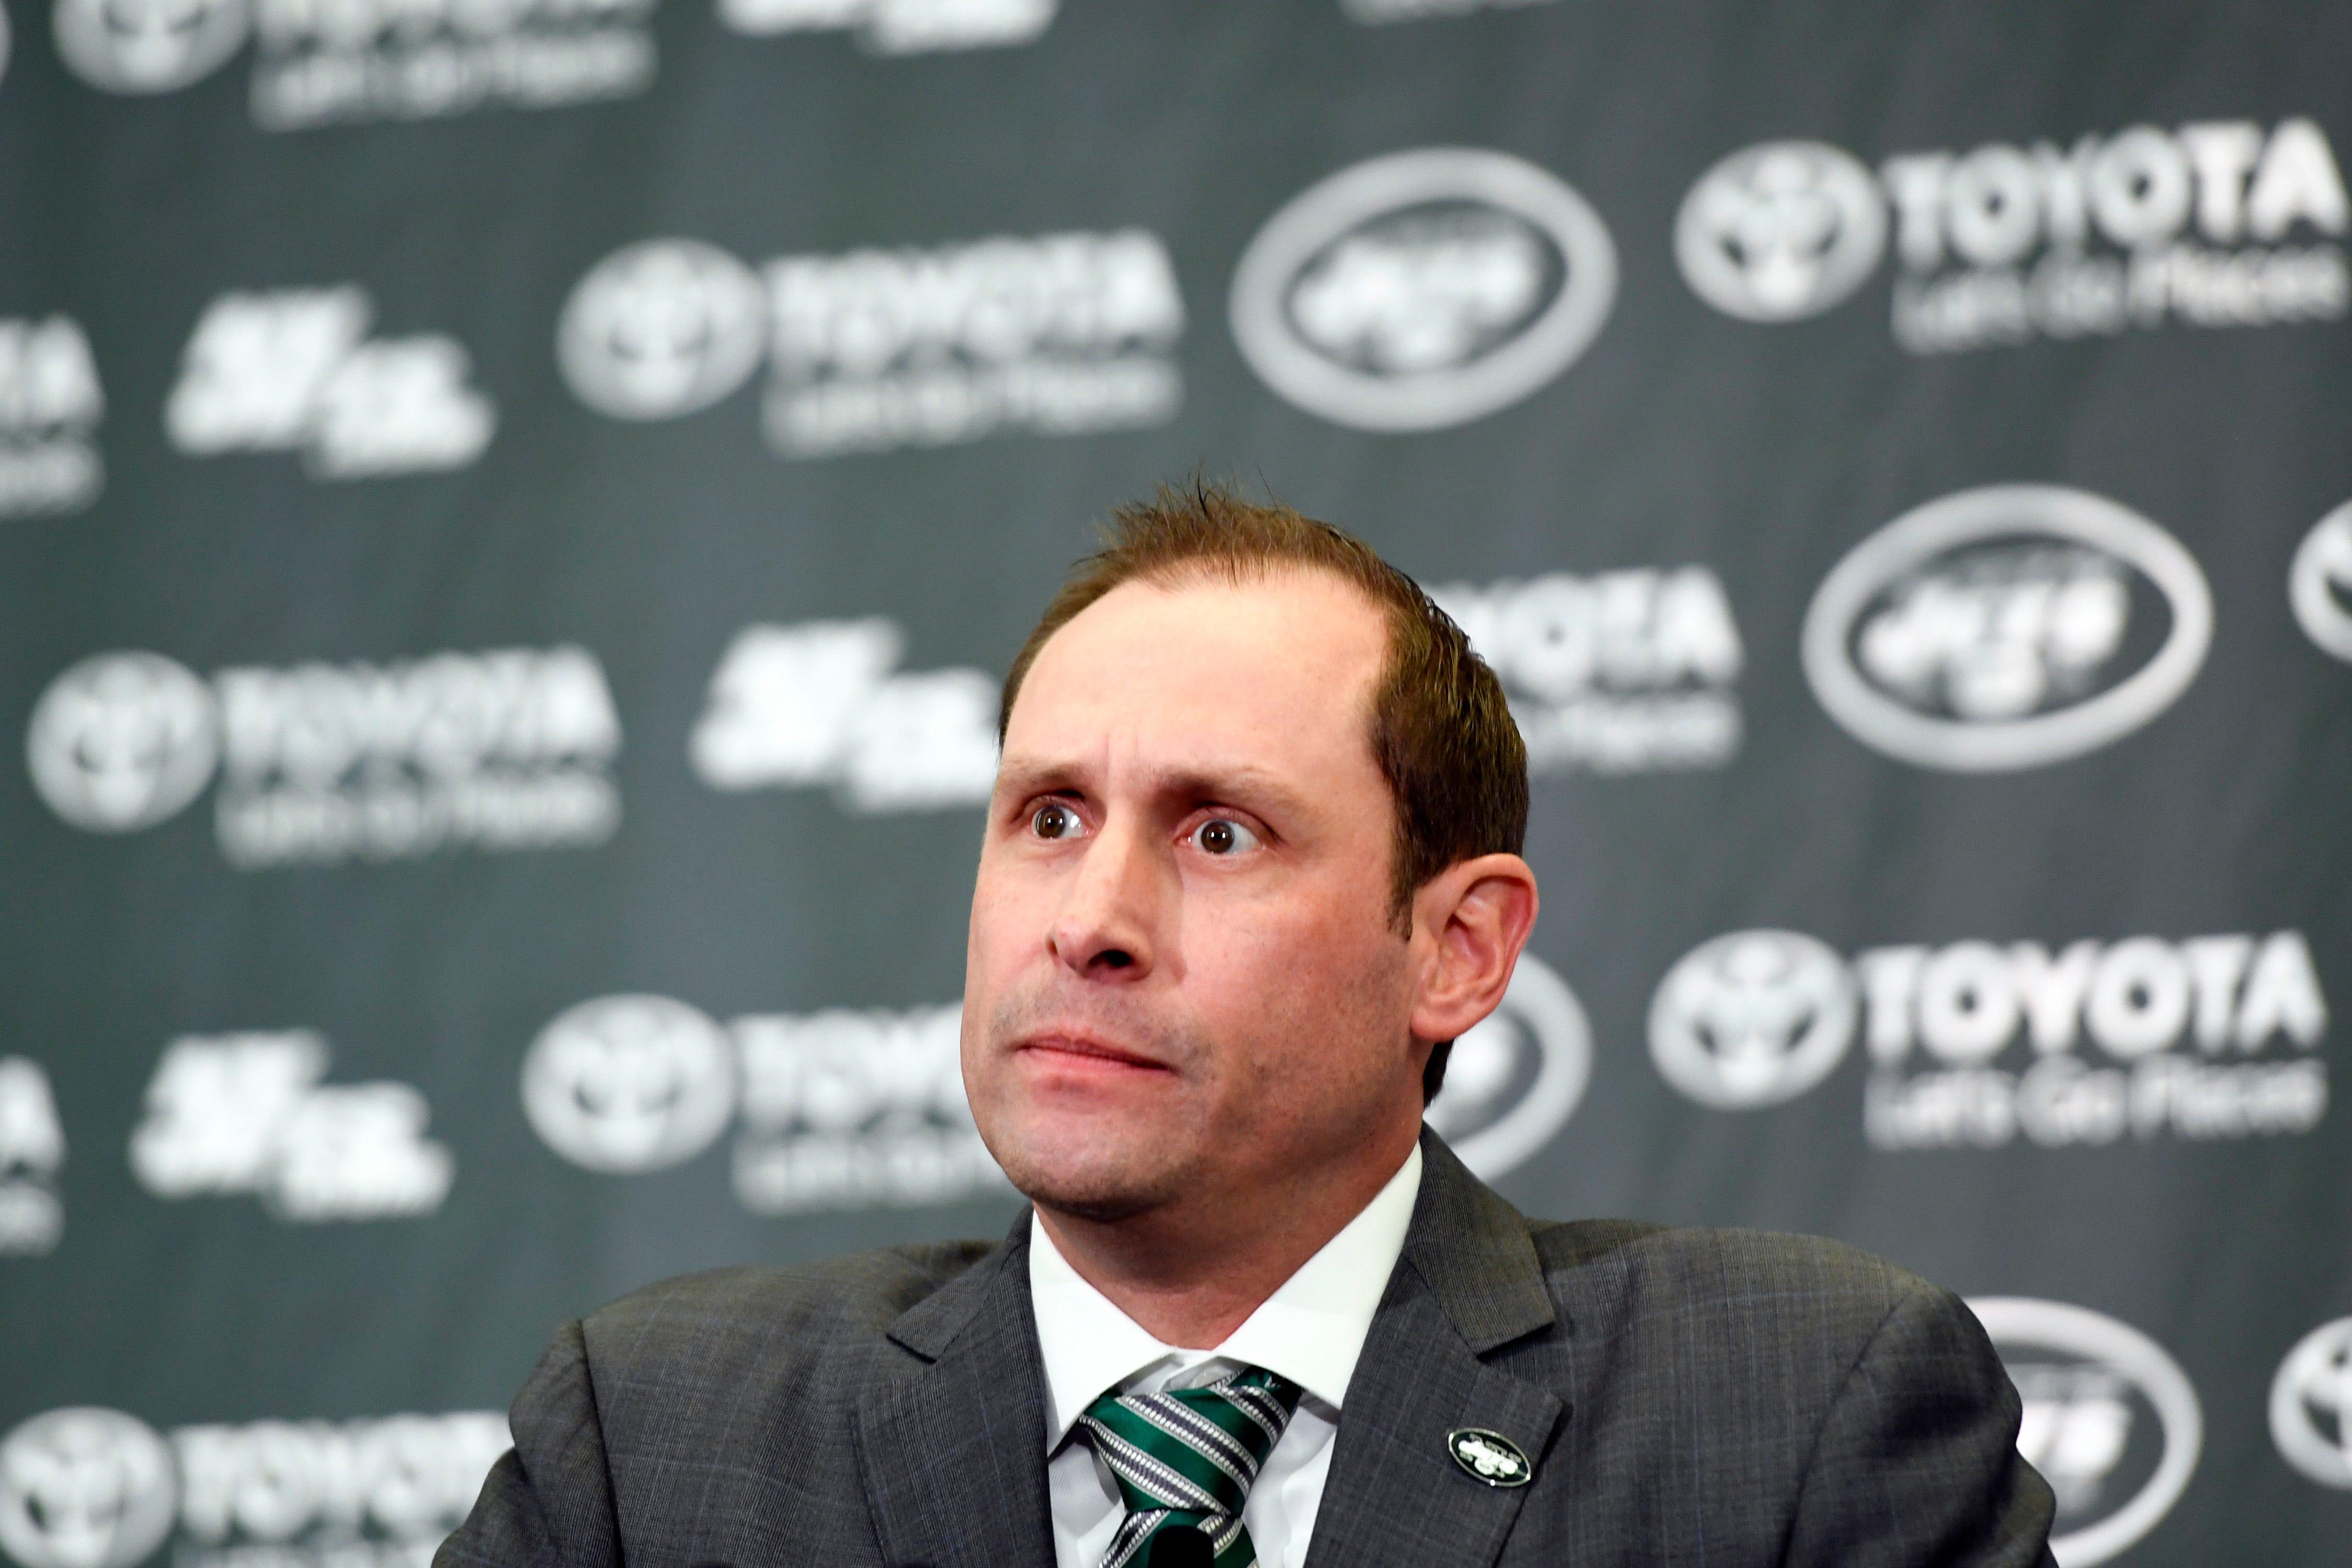 Jets' Adam Gase reveals full coaching staff, including Jim Bob Cooter